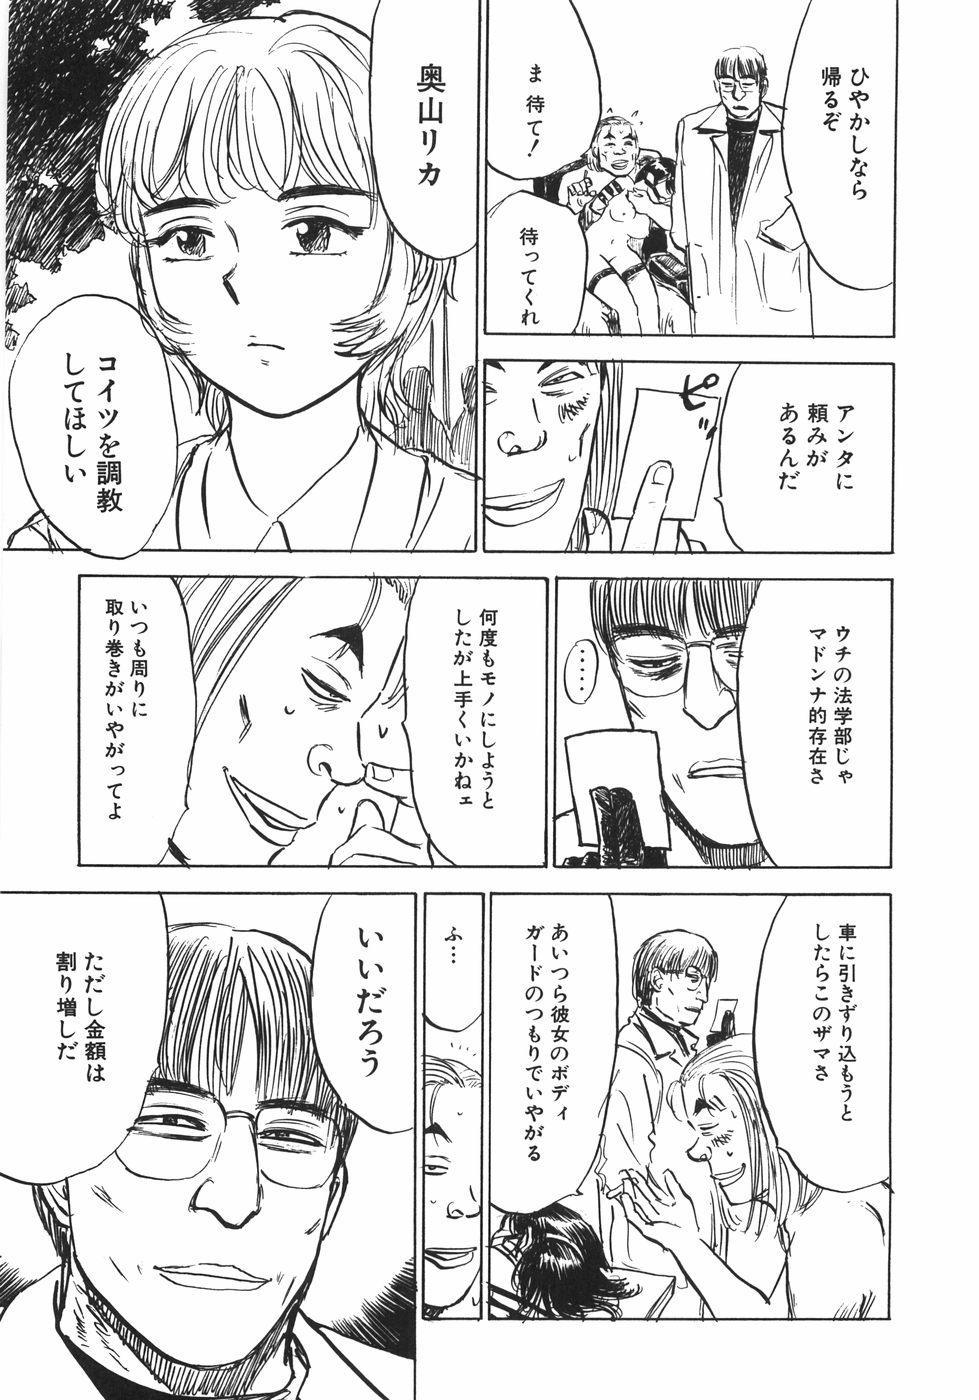 Ningyou no Yakata - The Doll House 91